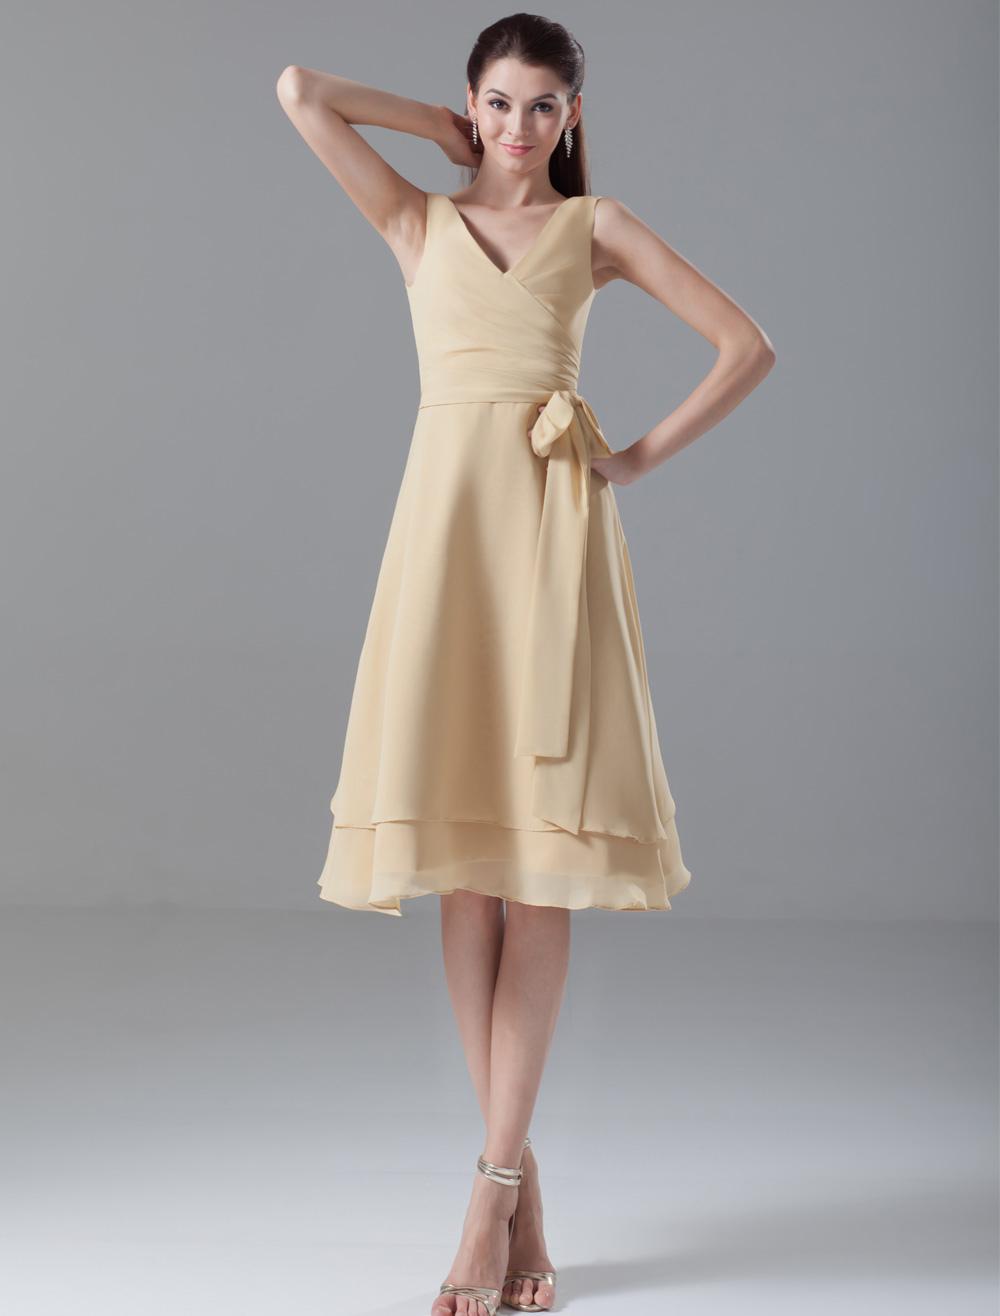 Champagne A-line Sash V-Neck Sleeveless Chiffon Elegant Cocktail Dress